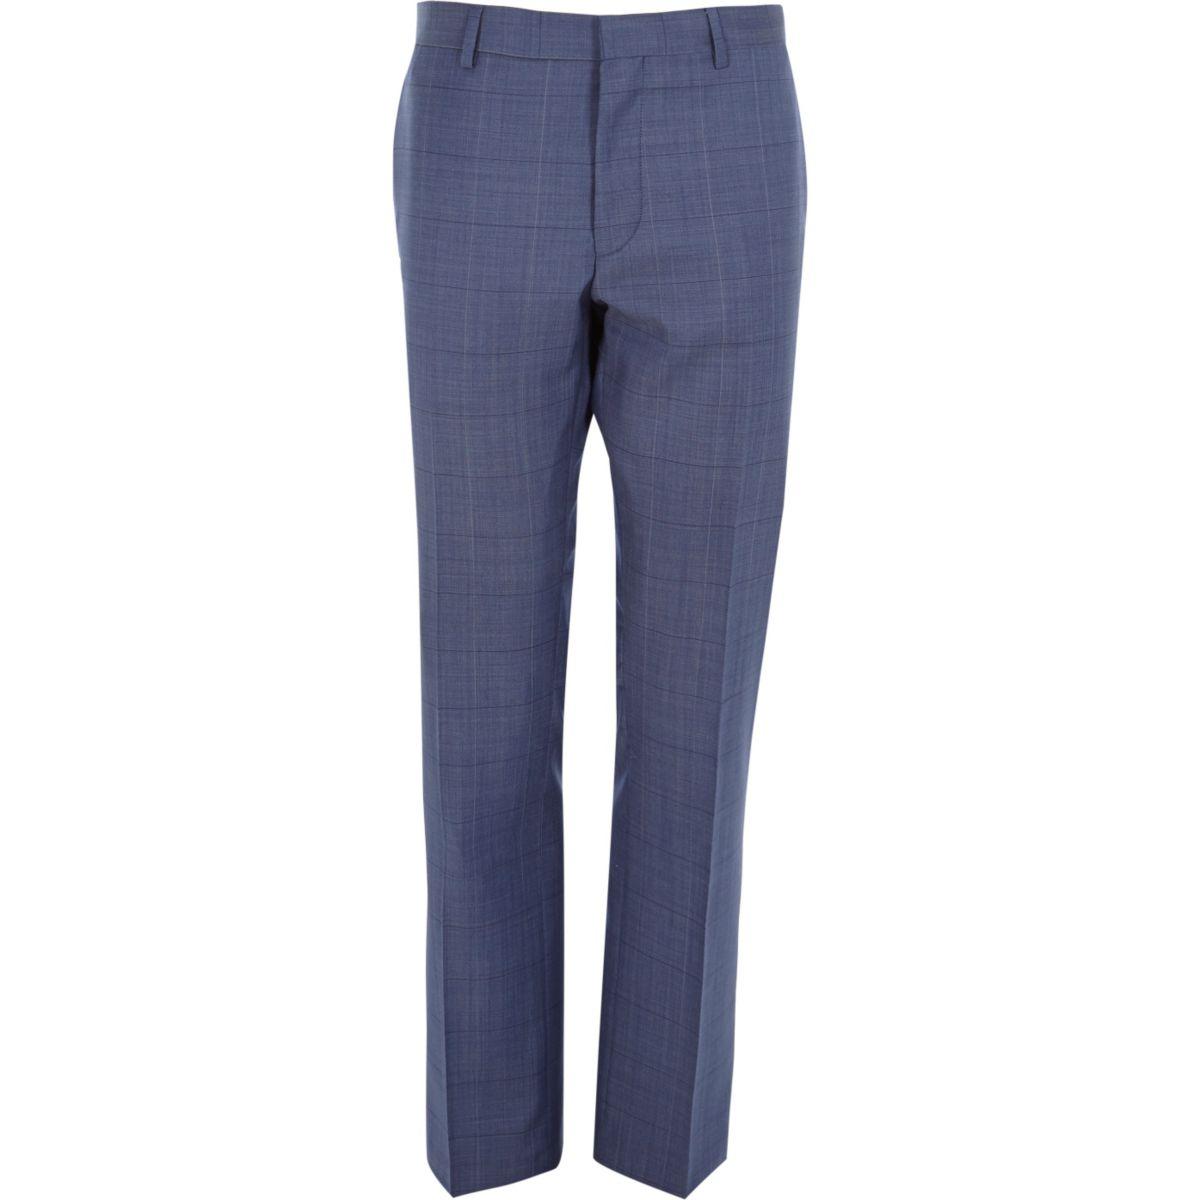 Navy subtle check wool-blend slim pants